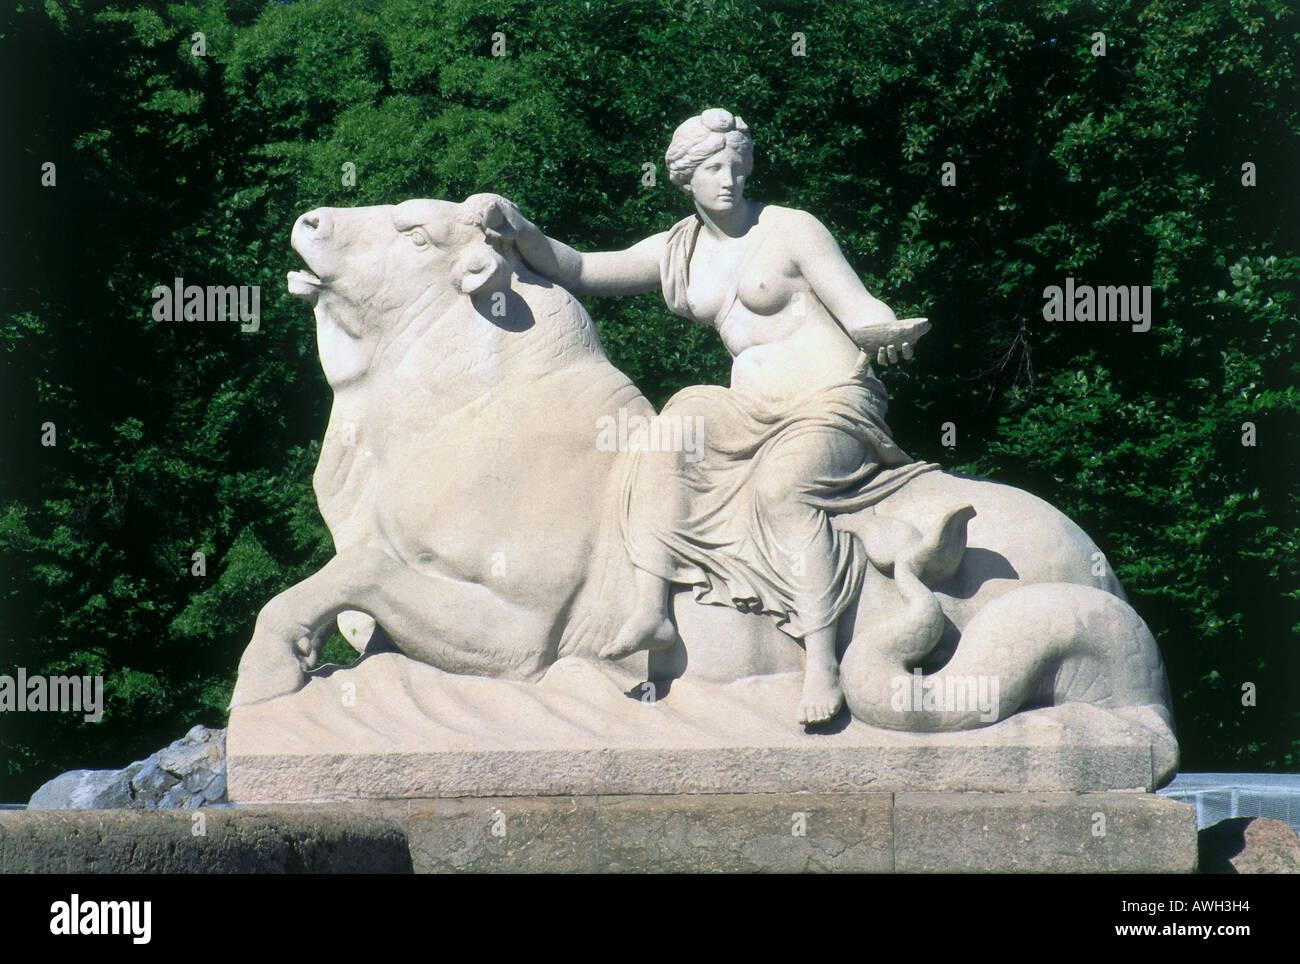 Germany, Bavaria, Munich, Lenbachplatz, Wittelsbacherbrunnen, allegorical statue woman bull goblet, fountain Adolf Hilderbrand - Stock Image